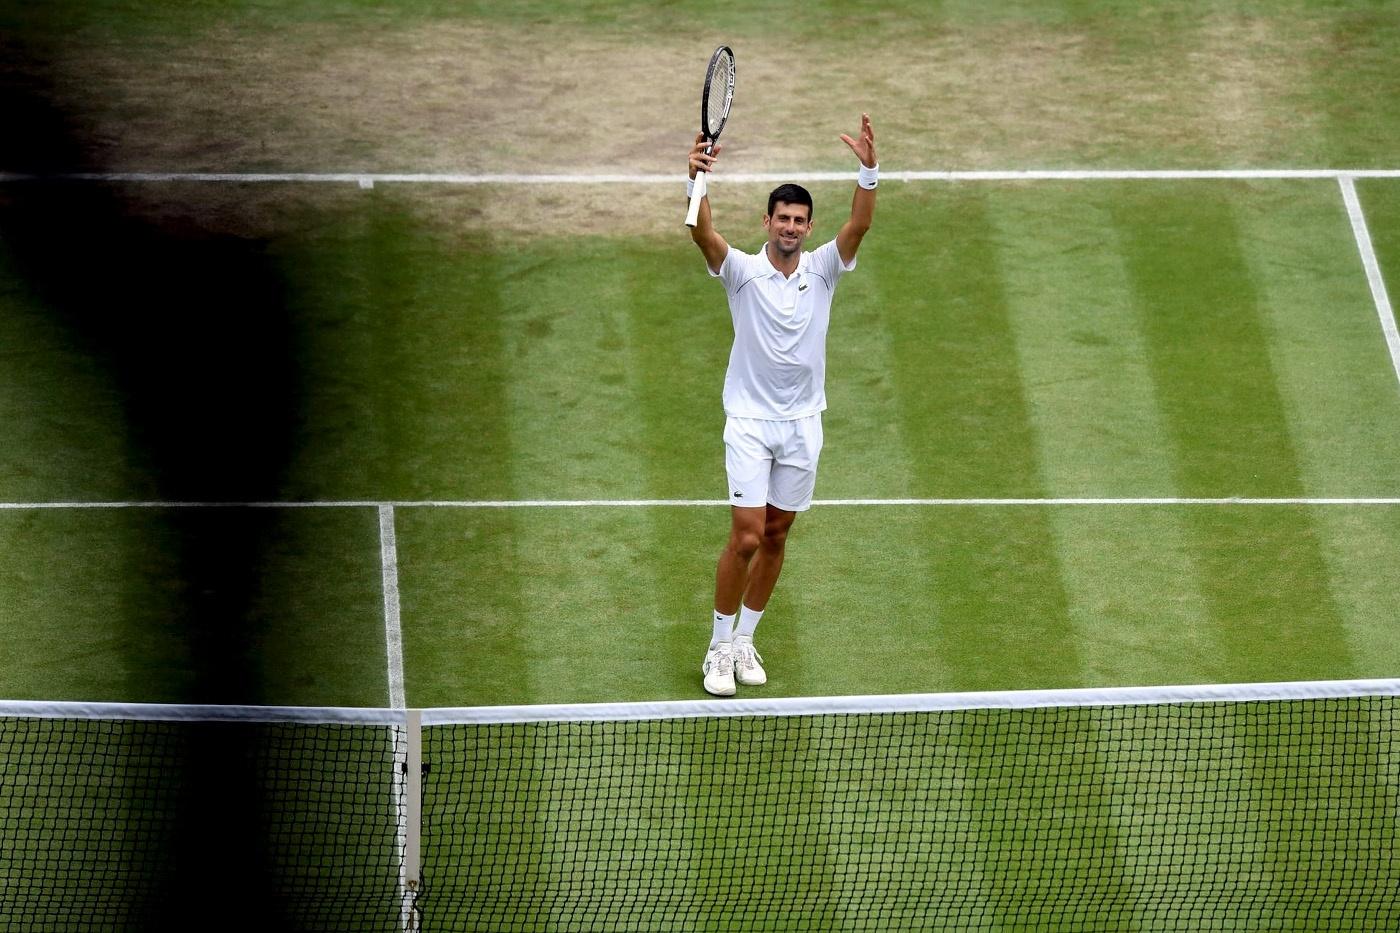 Djokovic eyes 20th Slam against heavyweight Berrettini in Wimbledon final